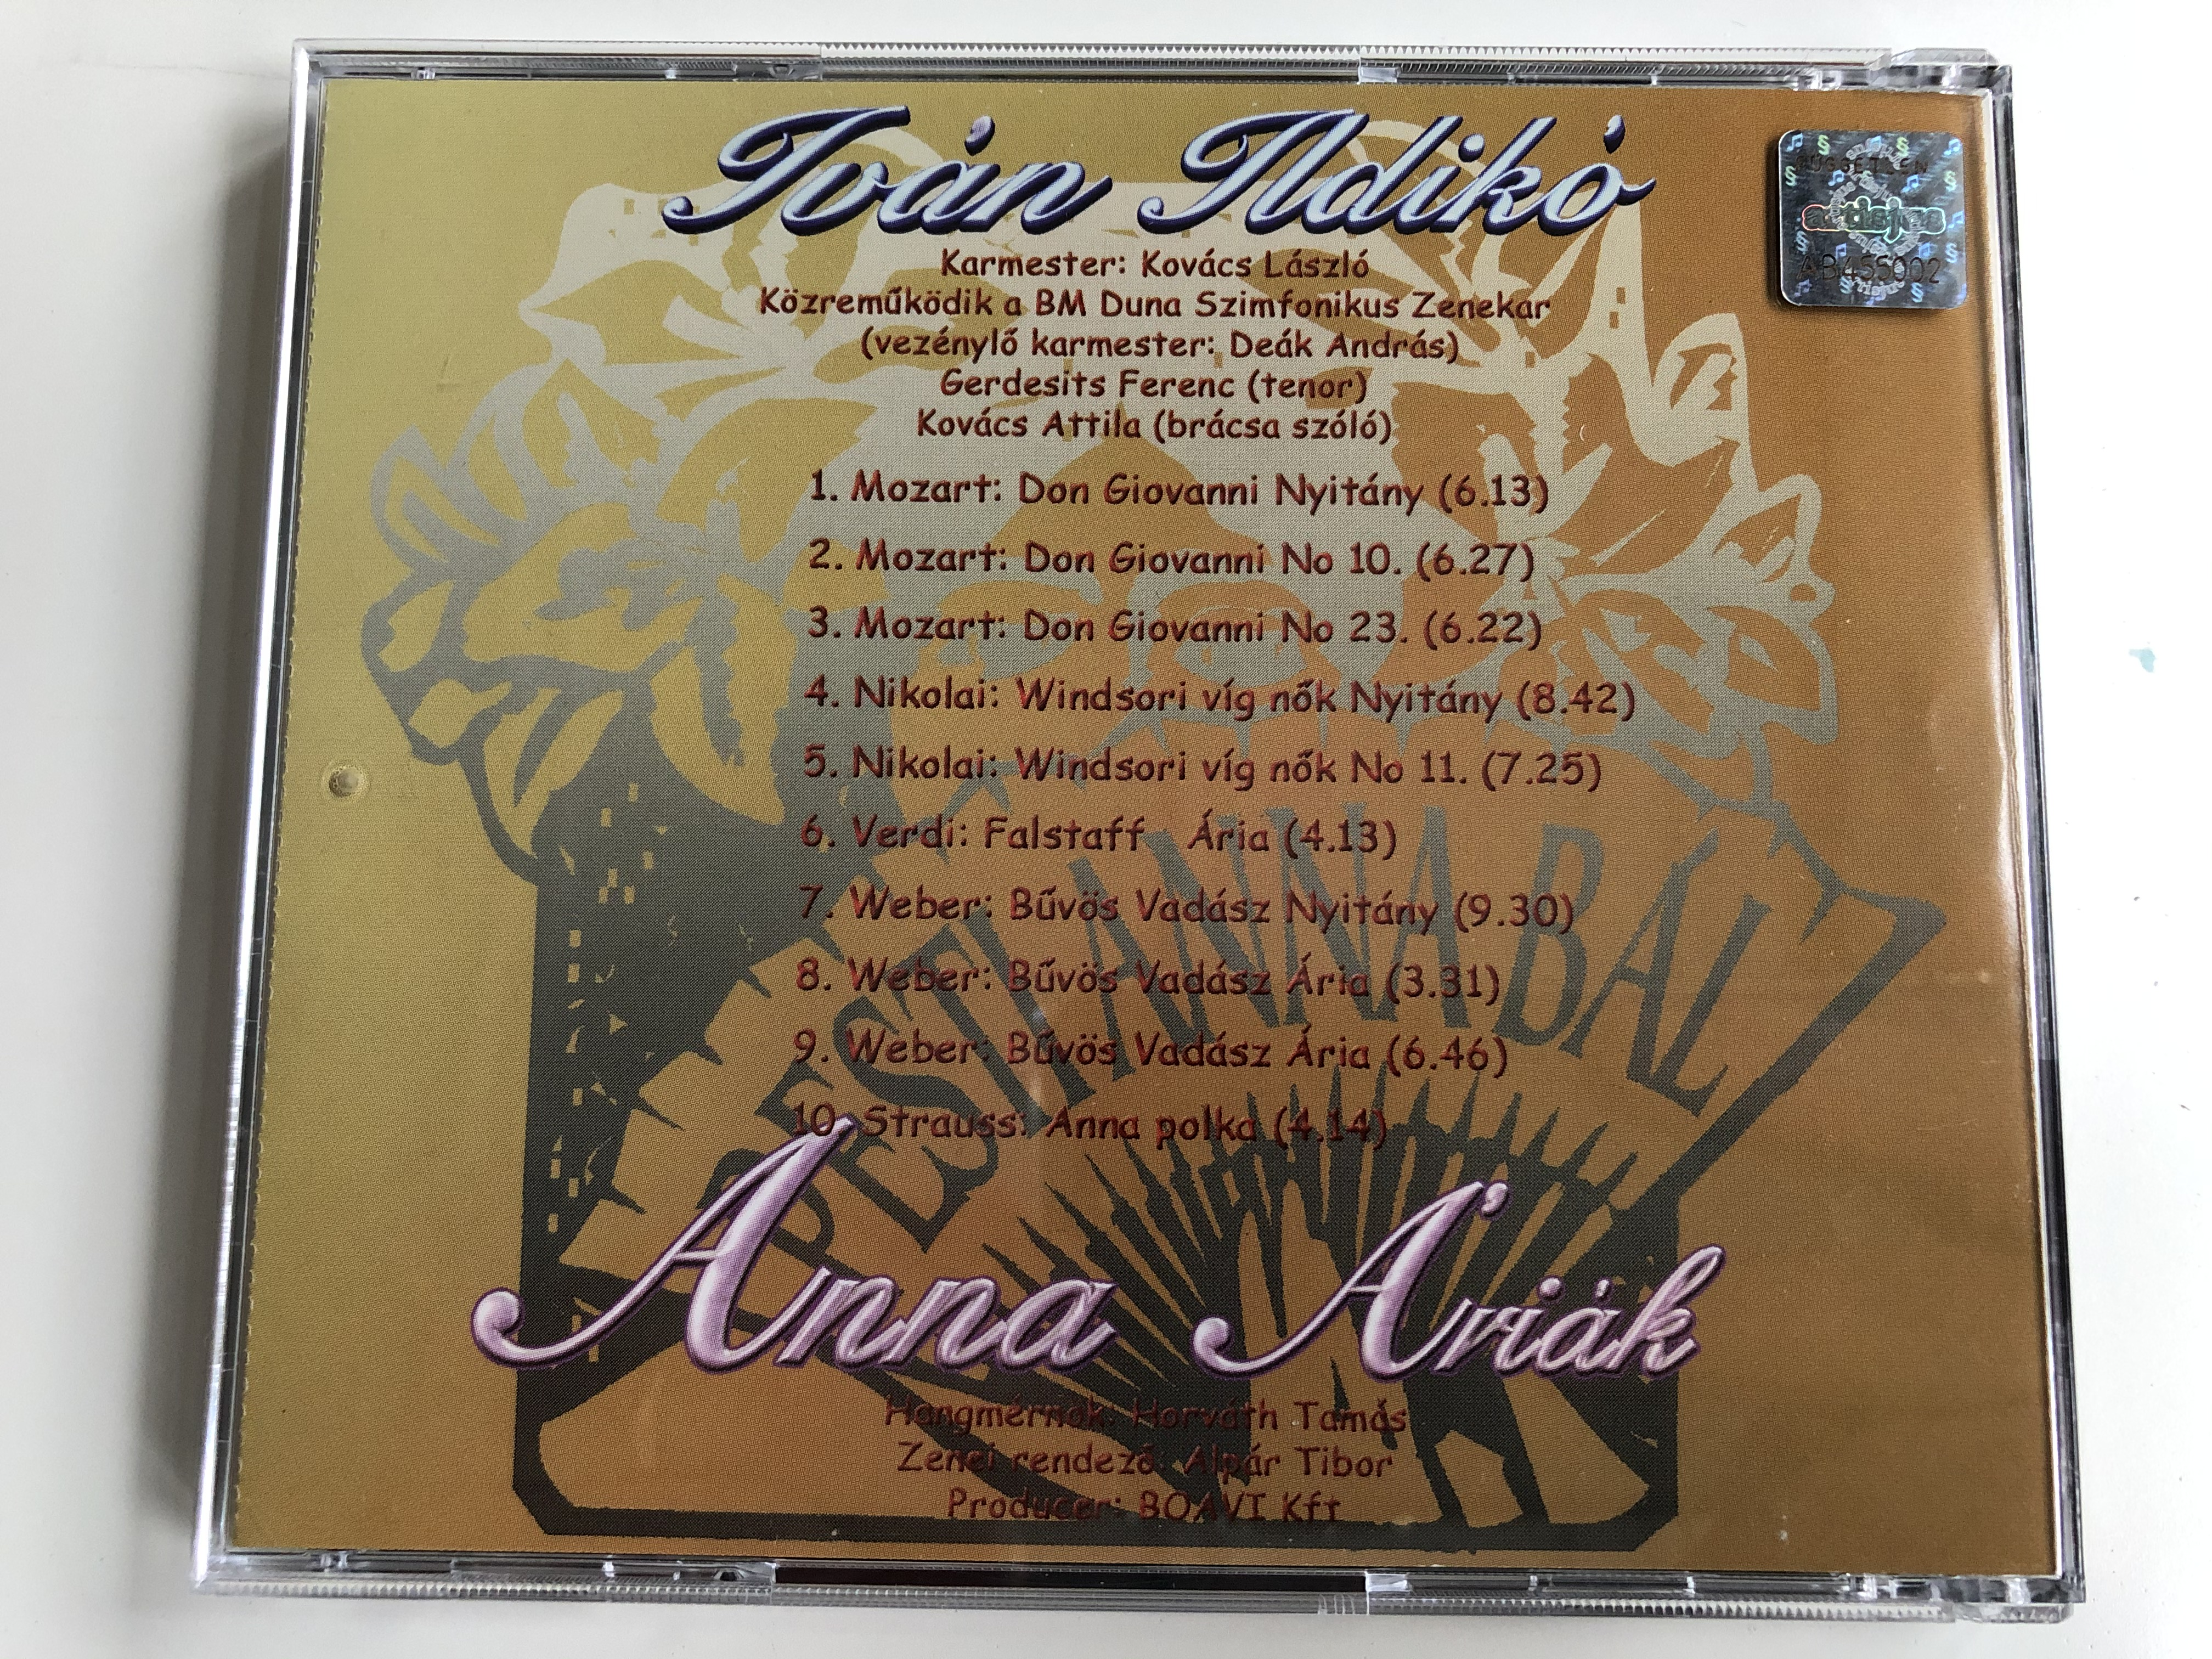 anna-ariak-ivan-ildiko-hungaroton-classic-audio-cd-2002-stereo-hcd-32173-5-.jpg